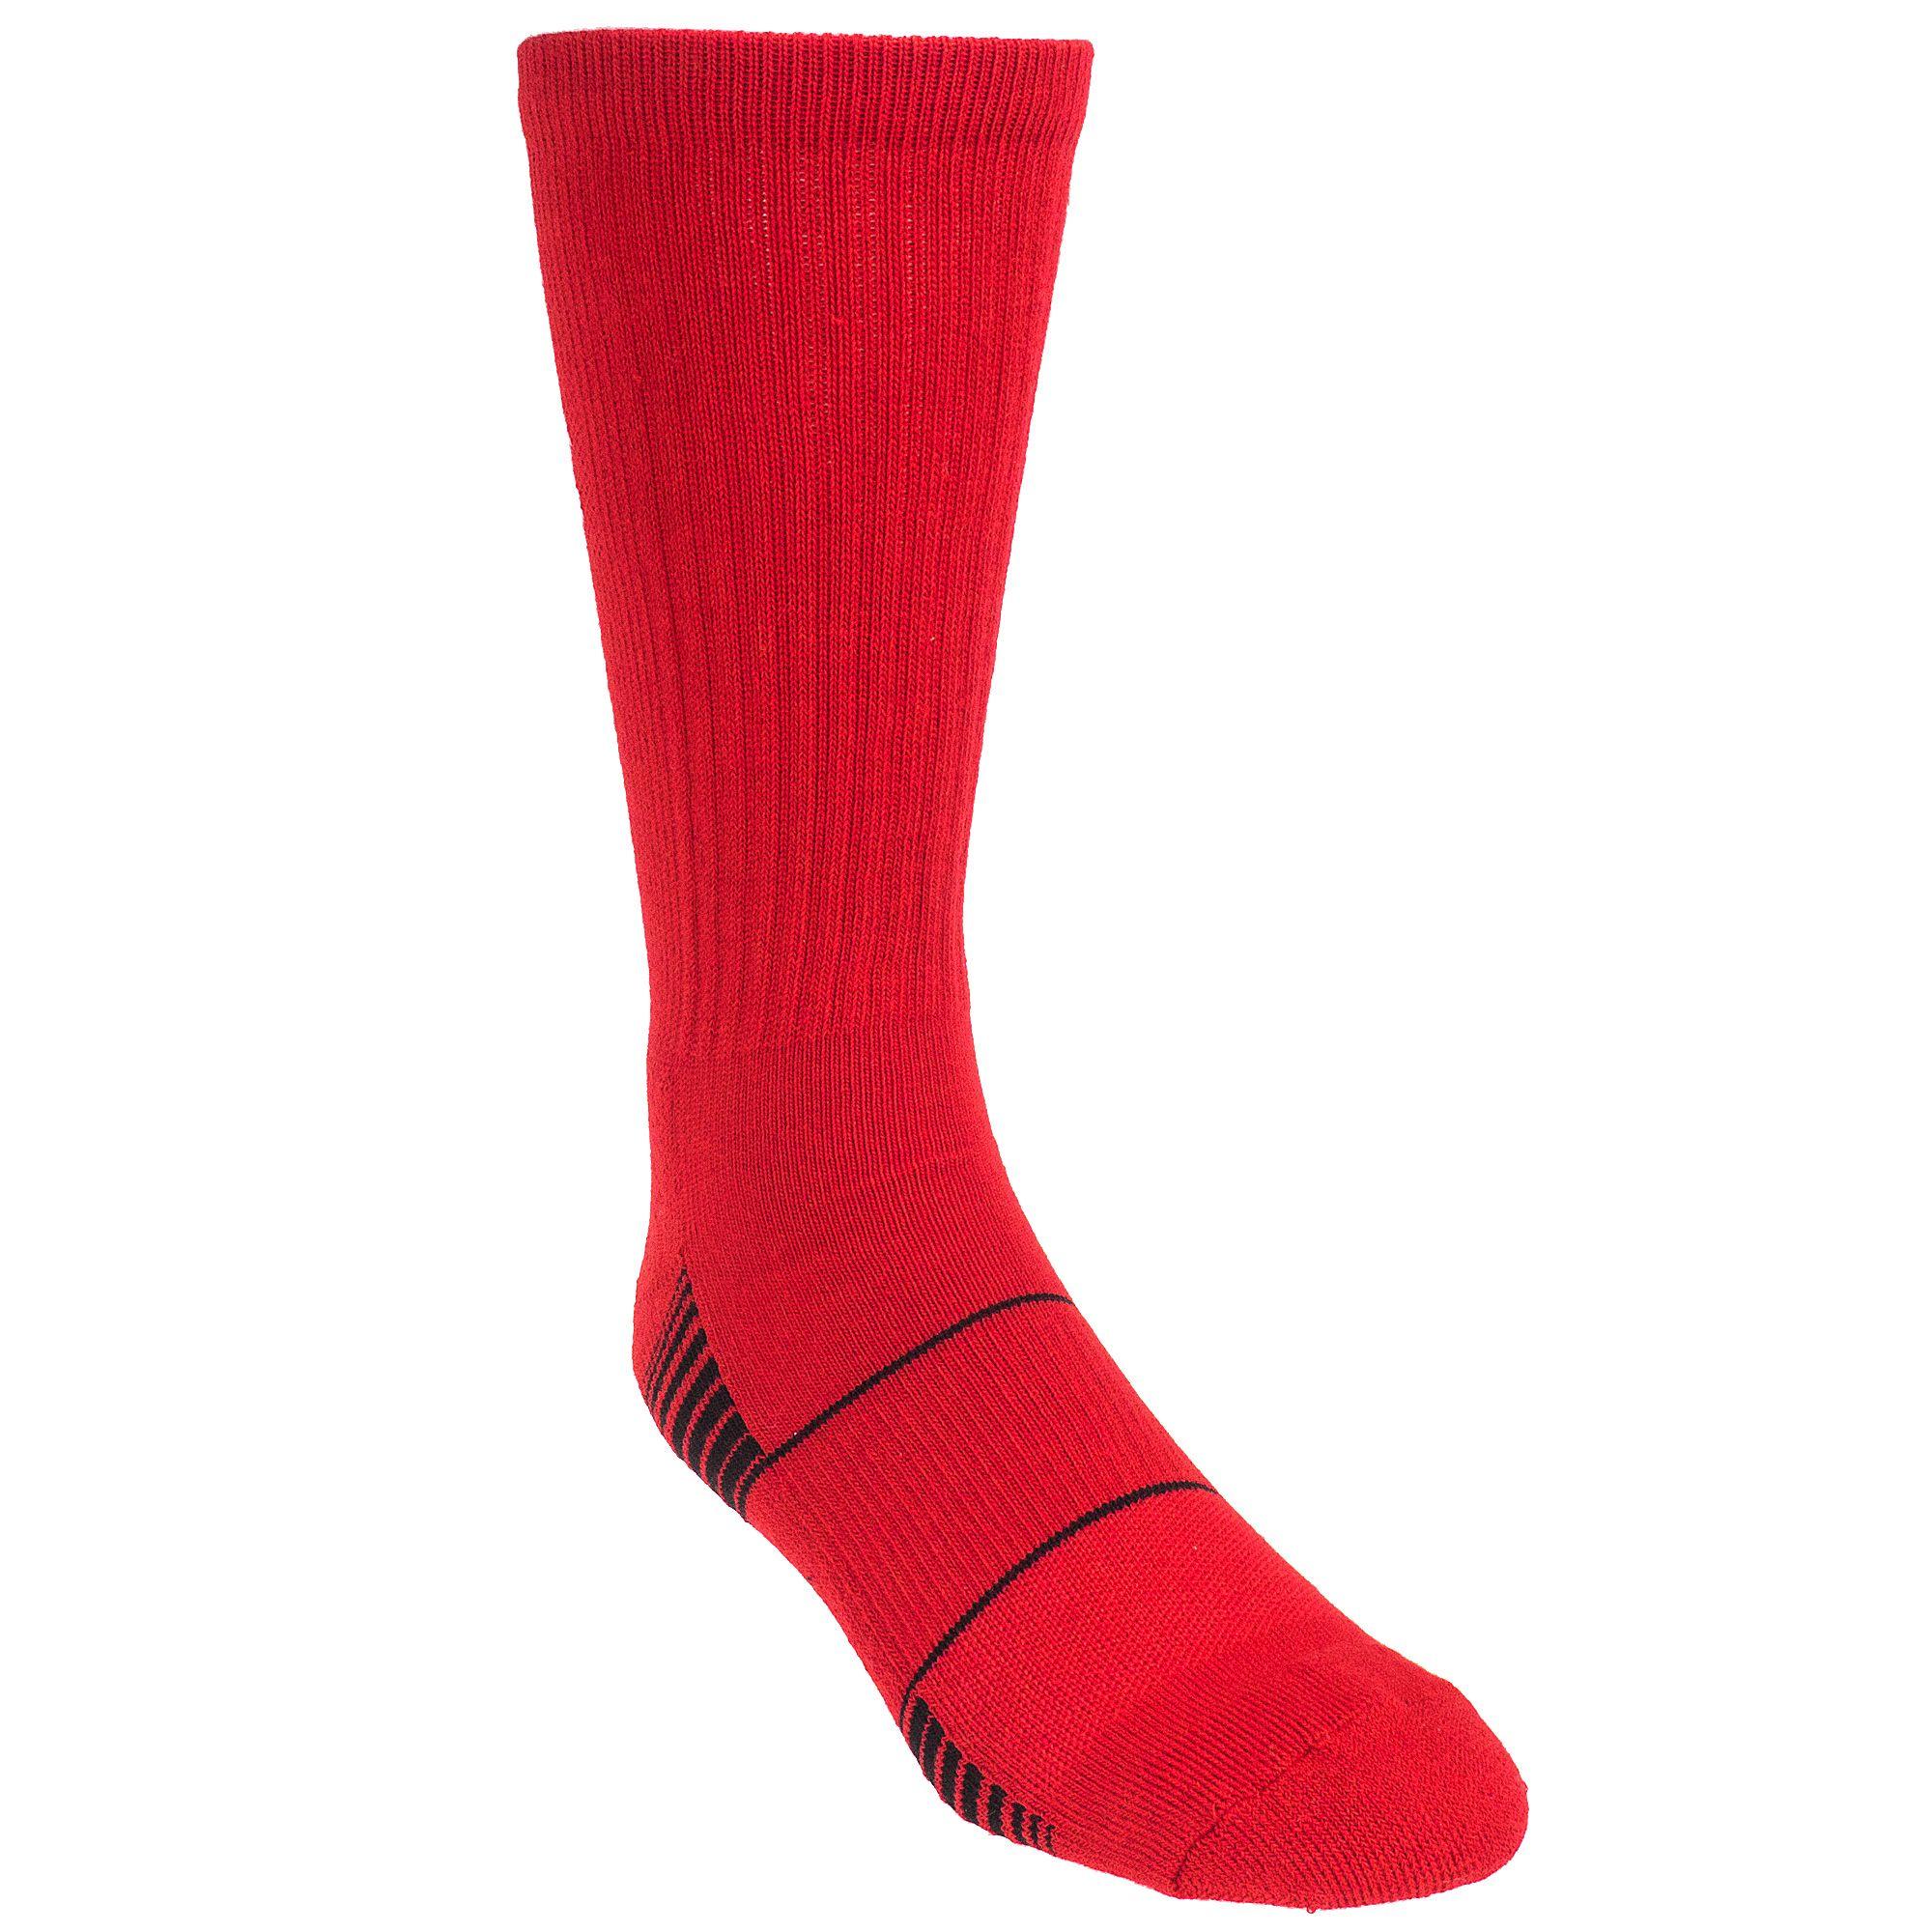 Under armour menus team u red moisturewicking athletic socks